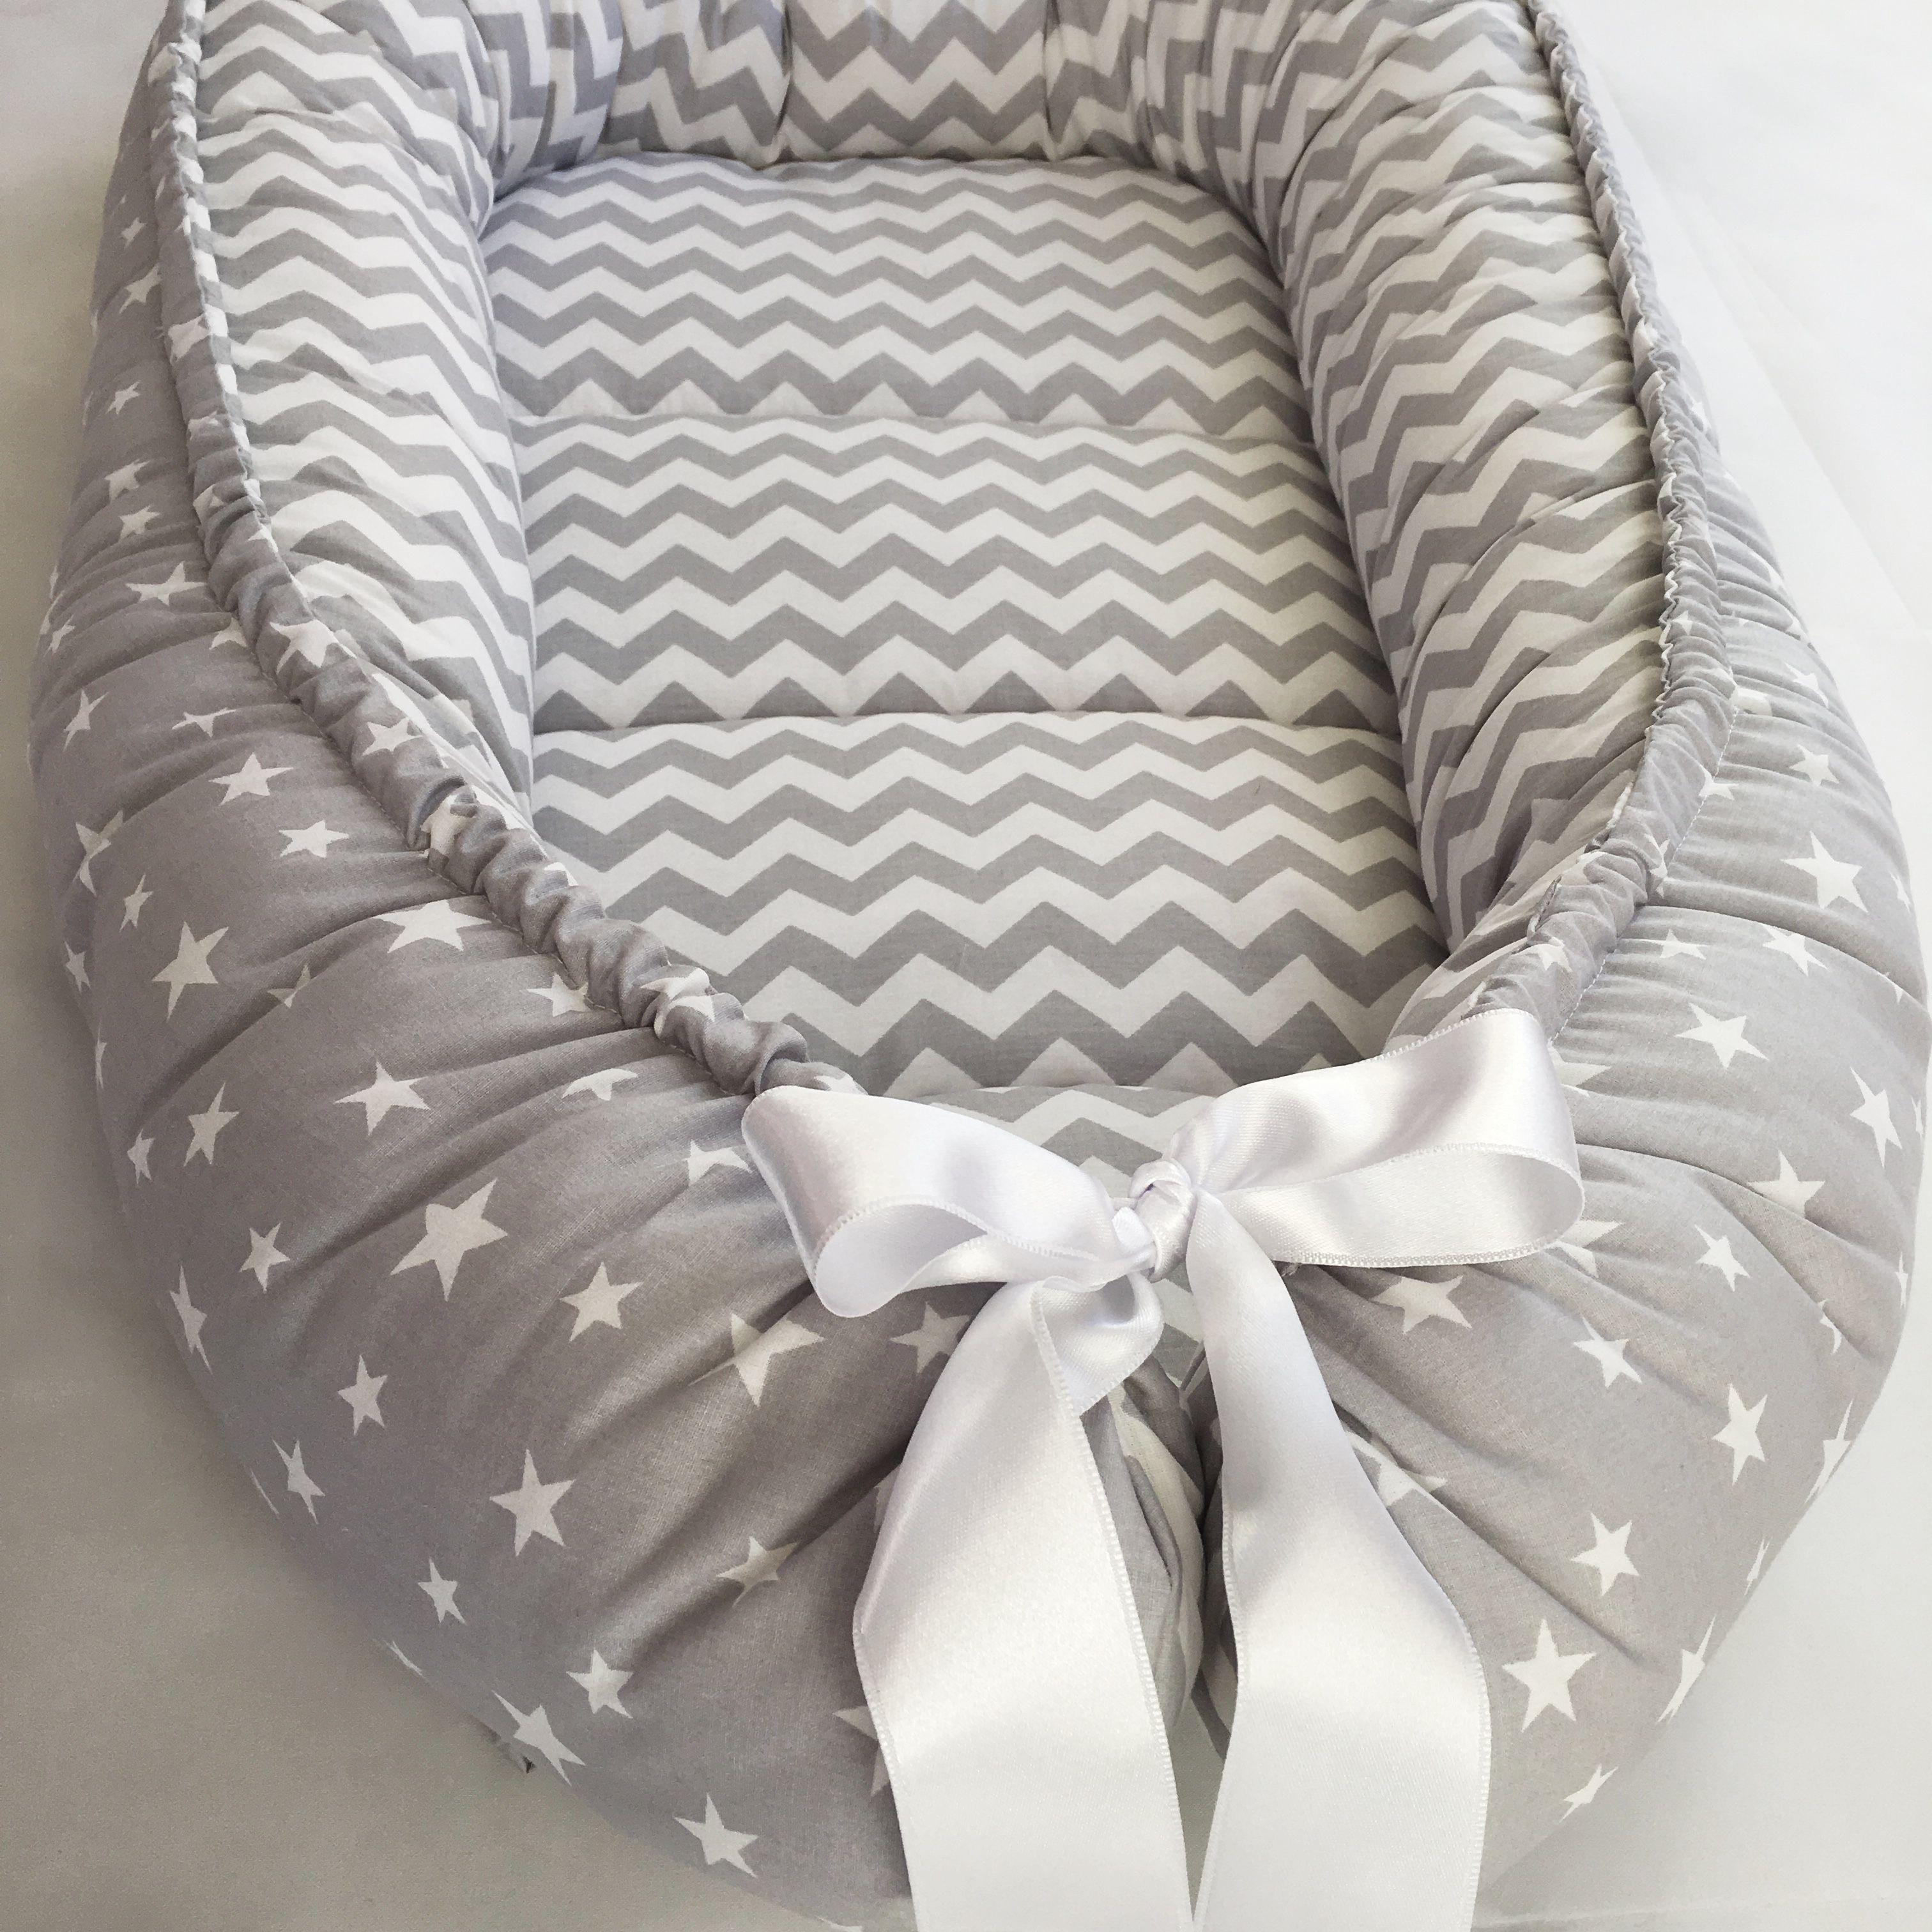 Pink Baby Nest Baby Nest Pink Double-Sided Baby nest Newborn Baby Nest Cocoon-Cradle Newborn Sleep Bed